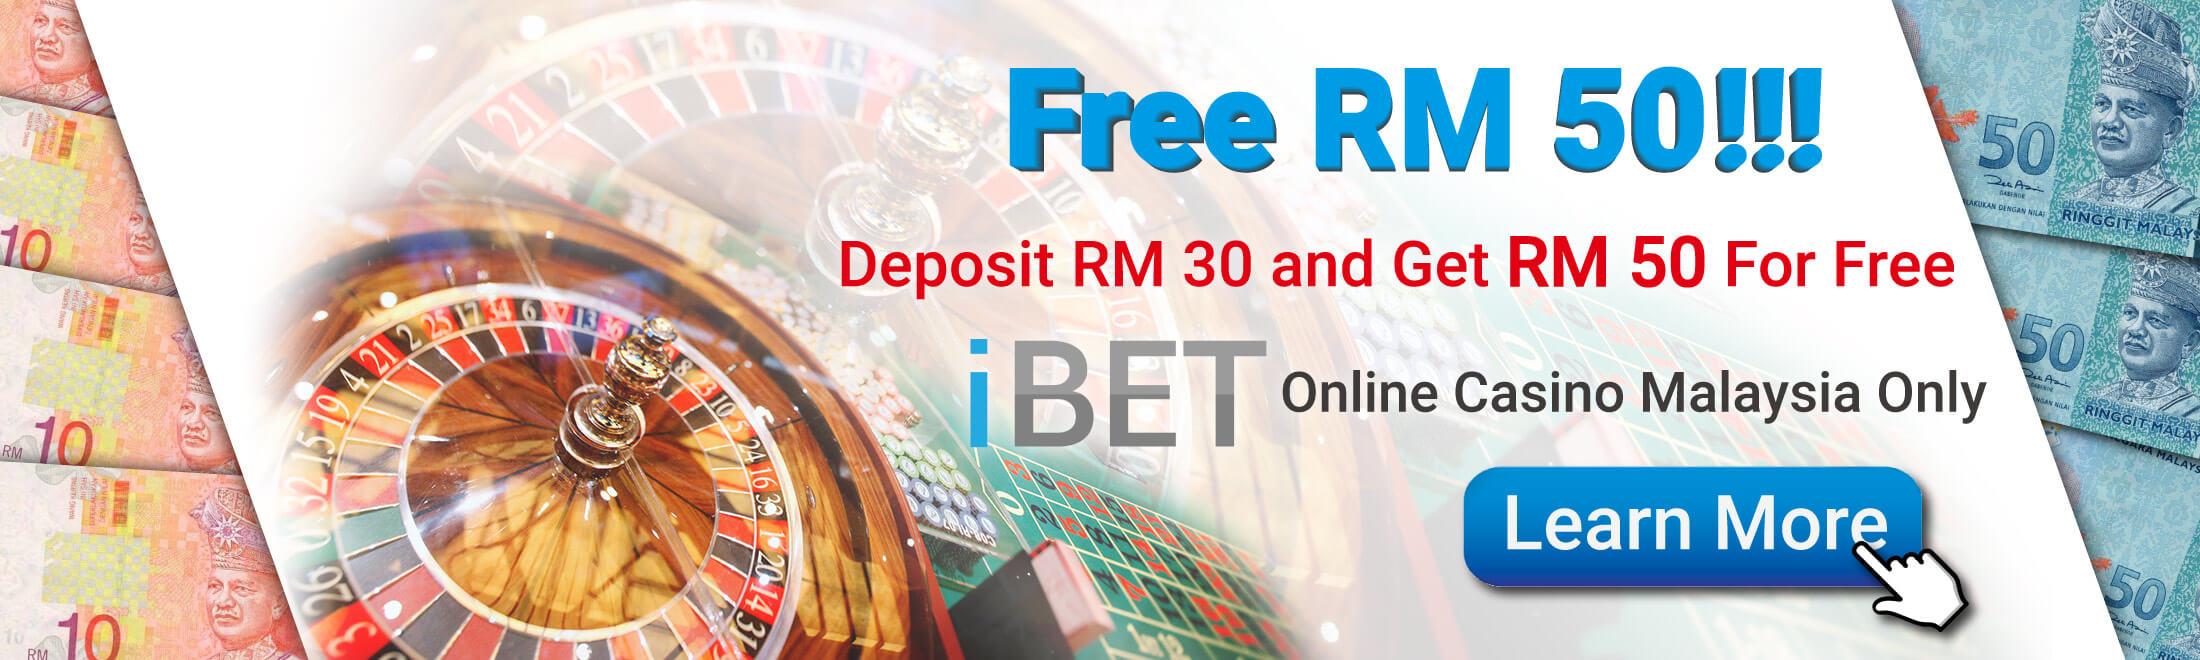 Malaysia online casino Deposit RM30 Free  RM50